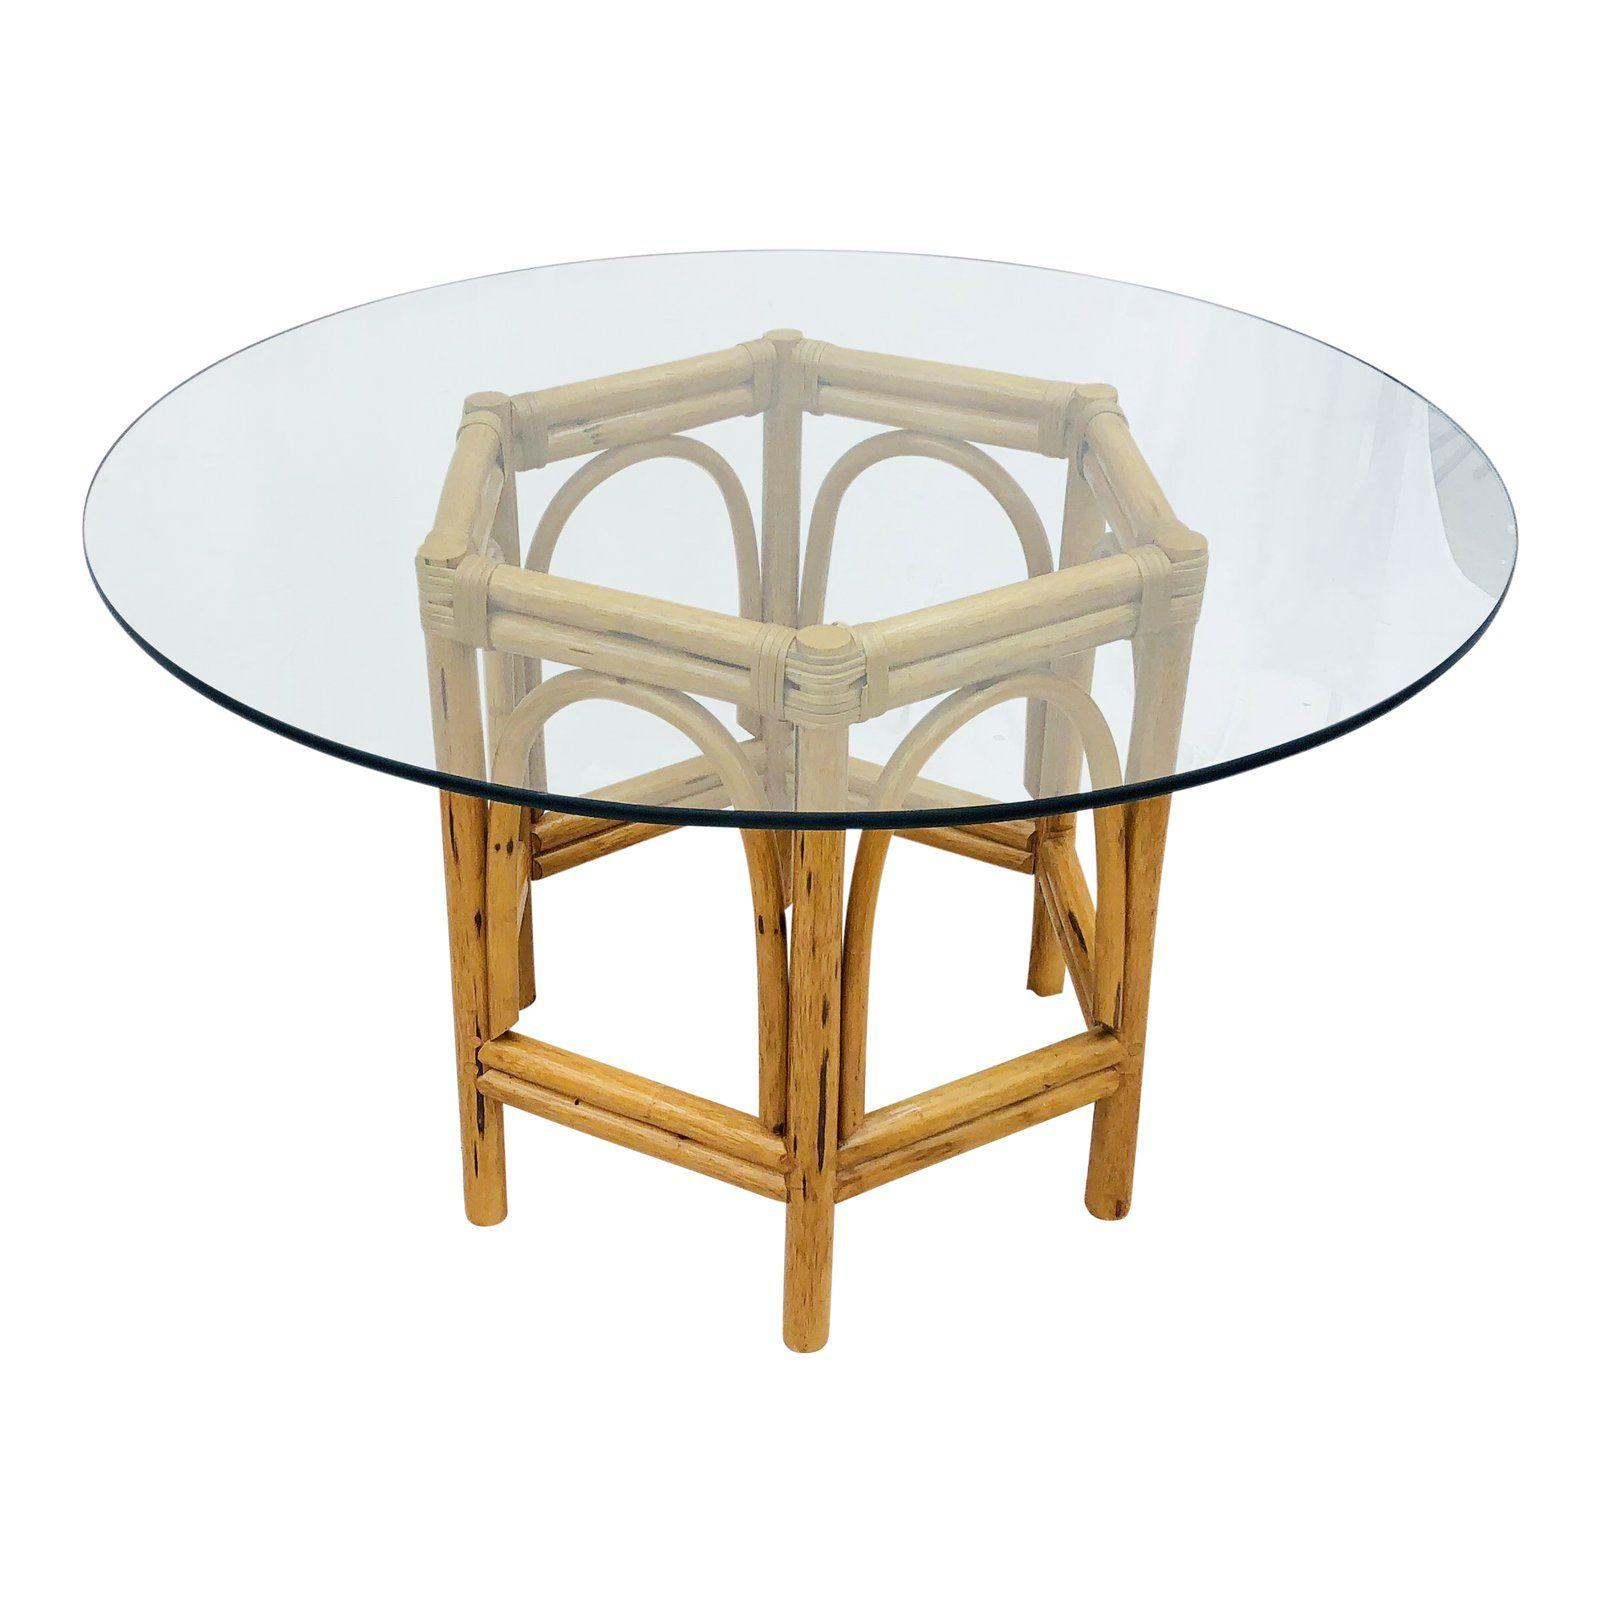 Vintage Bent Rattan Glass Table Glass Top Dining Table Glass Table Glass Dining Table